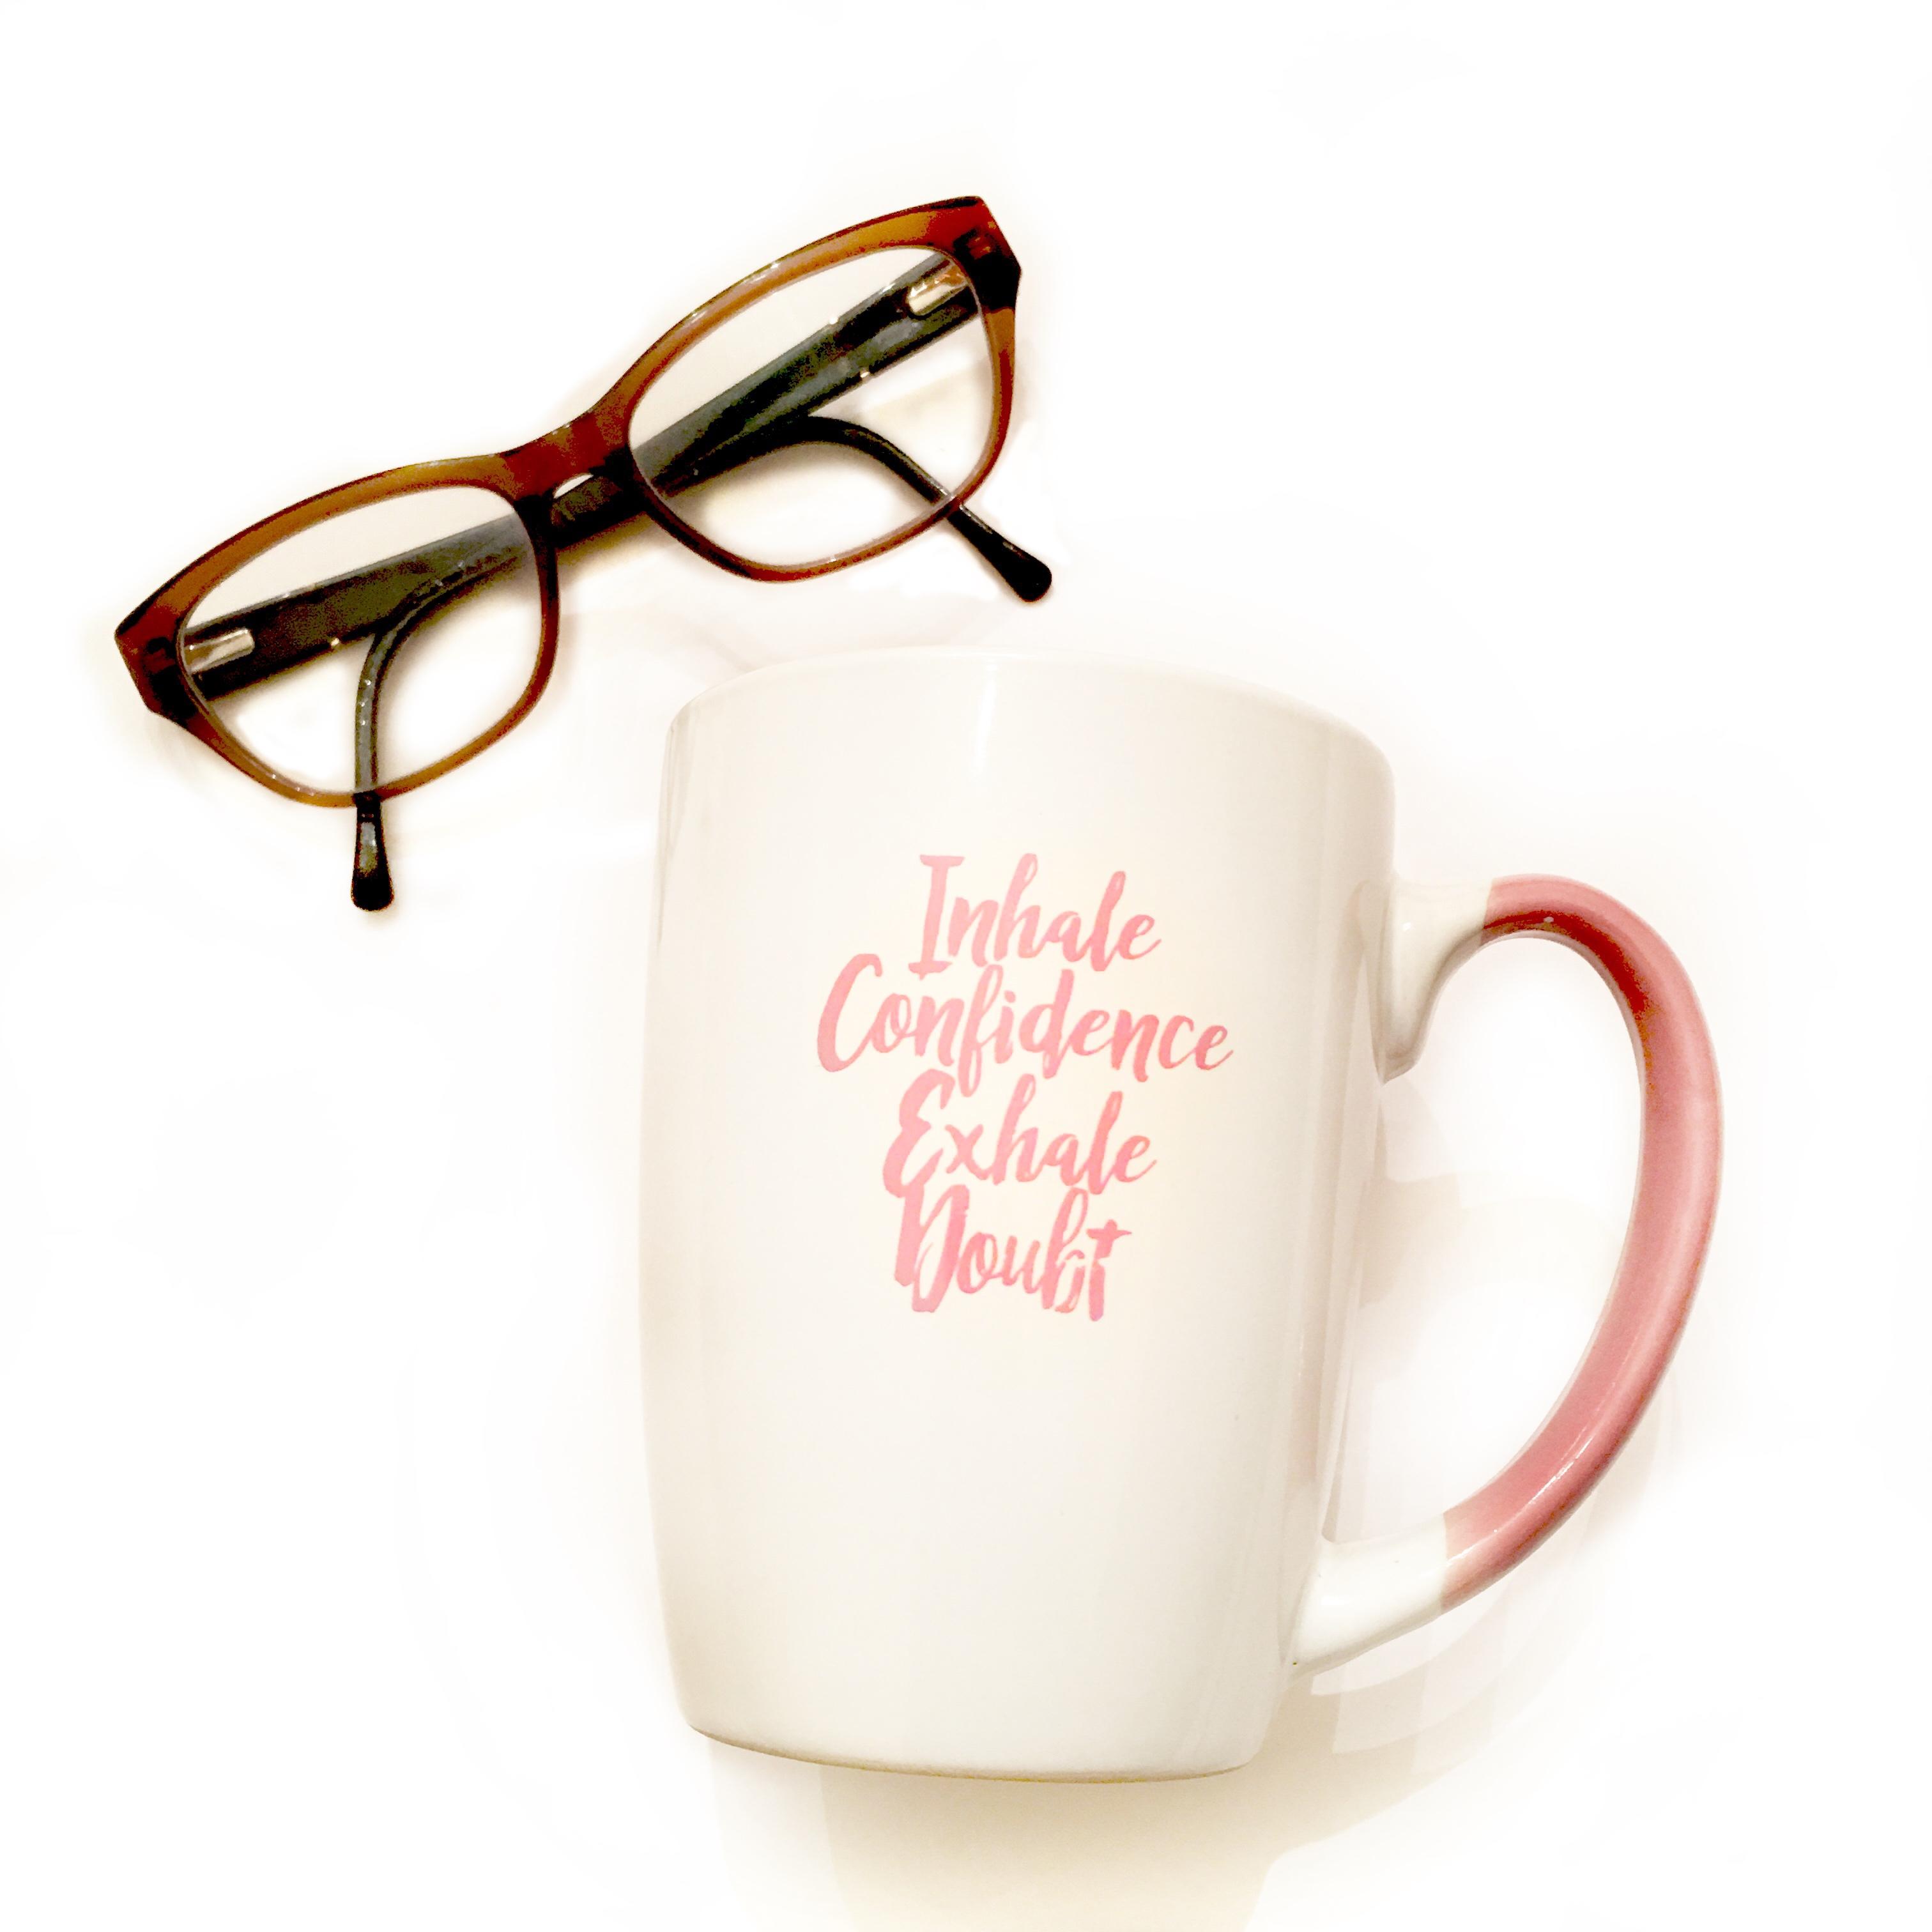 Inhale Confidence Exhale Doubt Mug.jpg